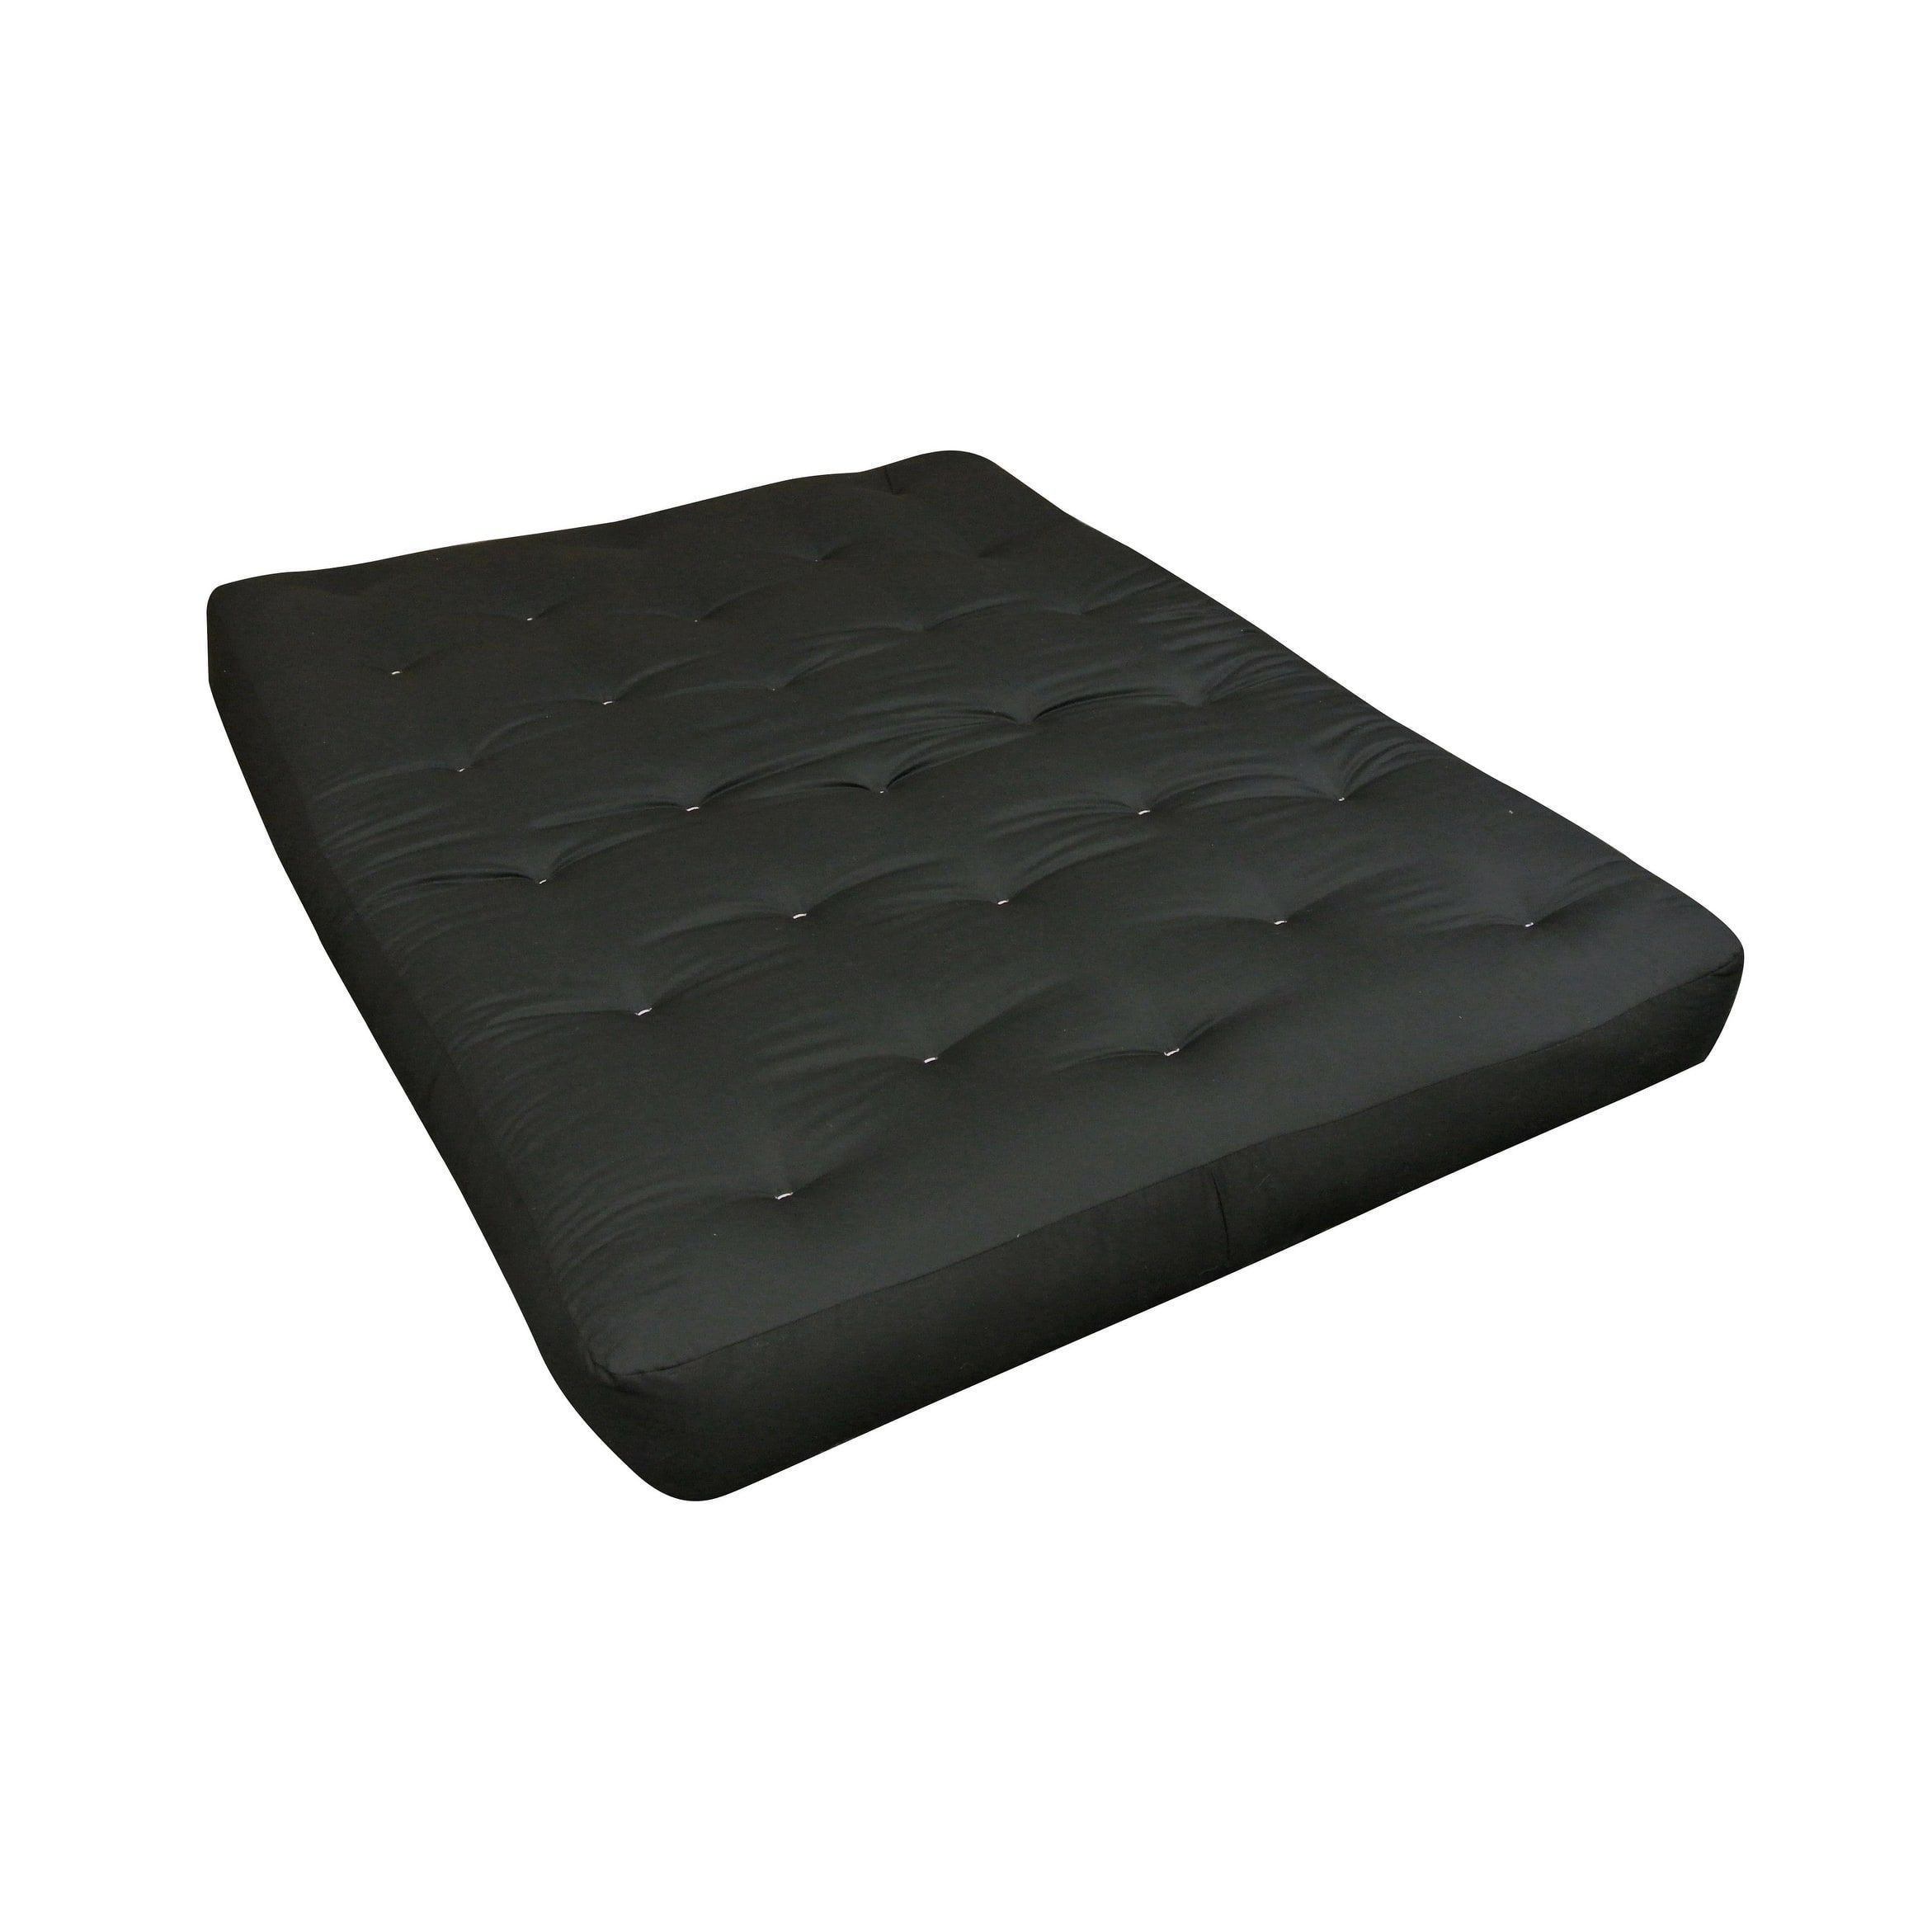 fortcoil black queen 9 inch duct futon mattress  black   polyester blend foam  fortcoil black queen 9 inch duct futon mattress  black      rh   pinterest